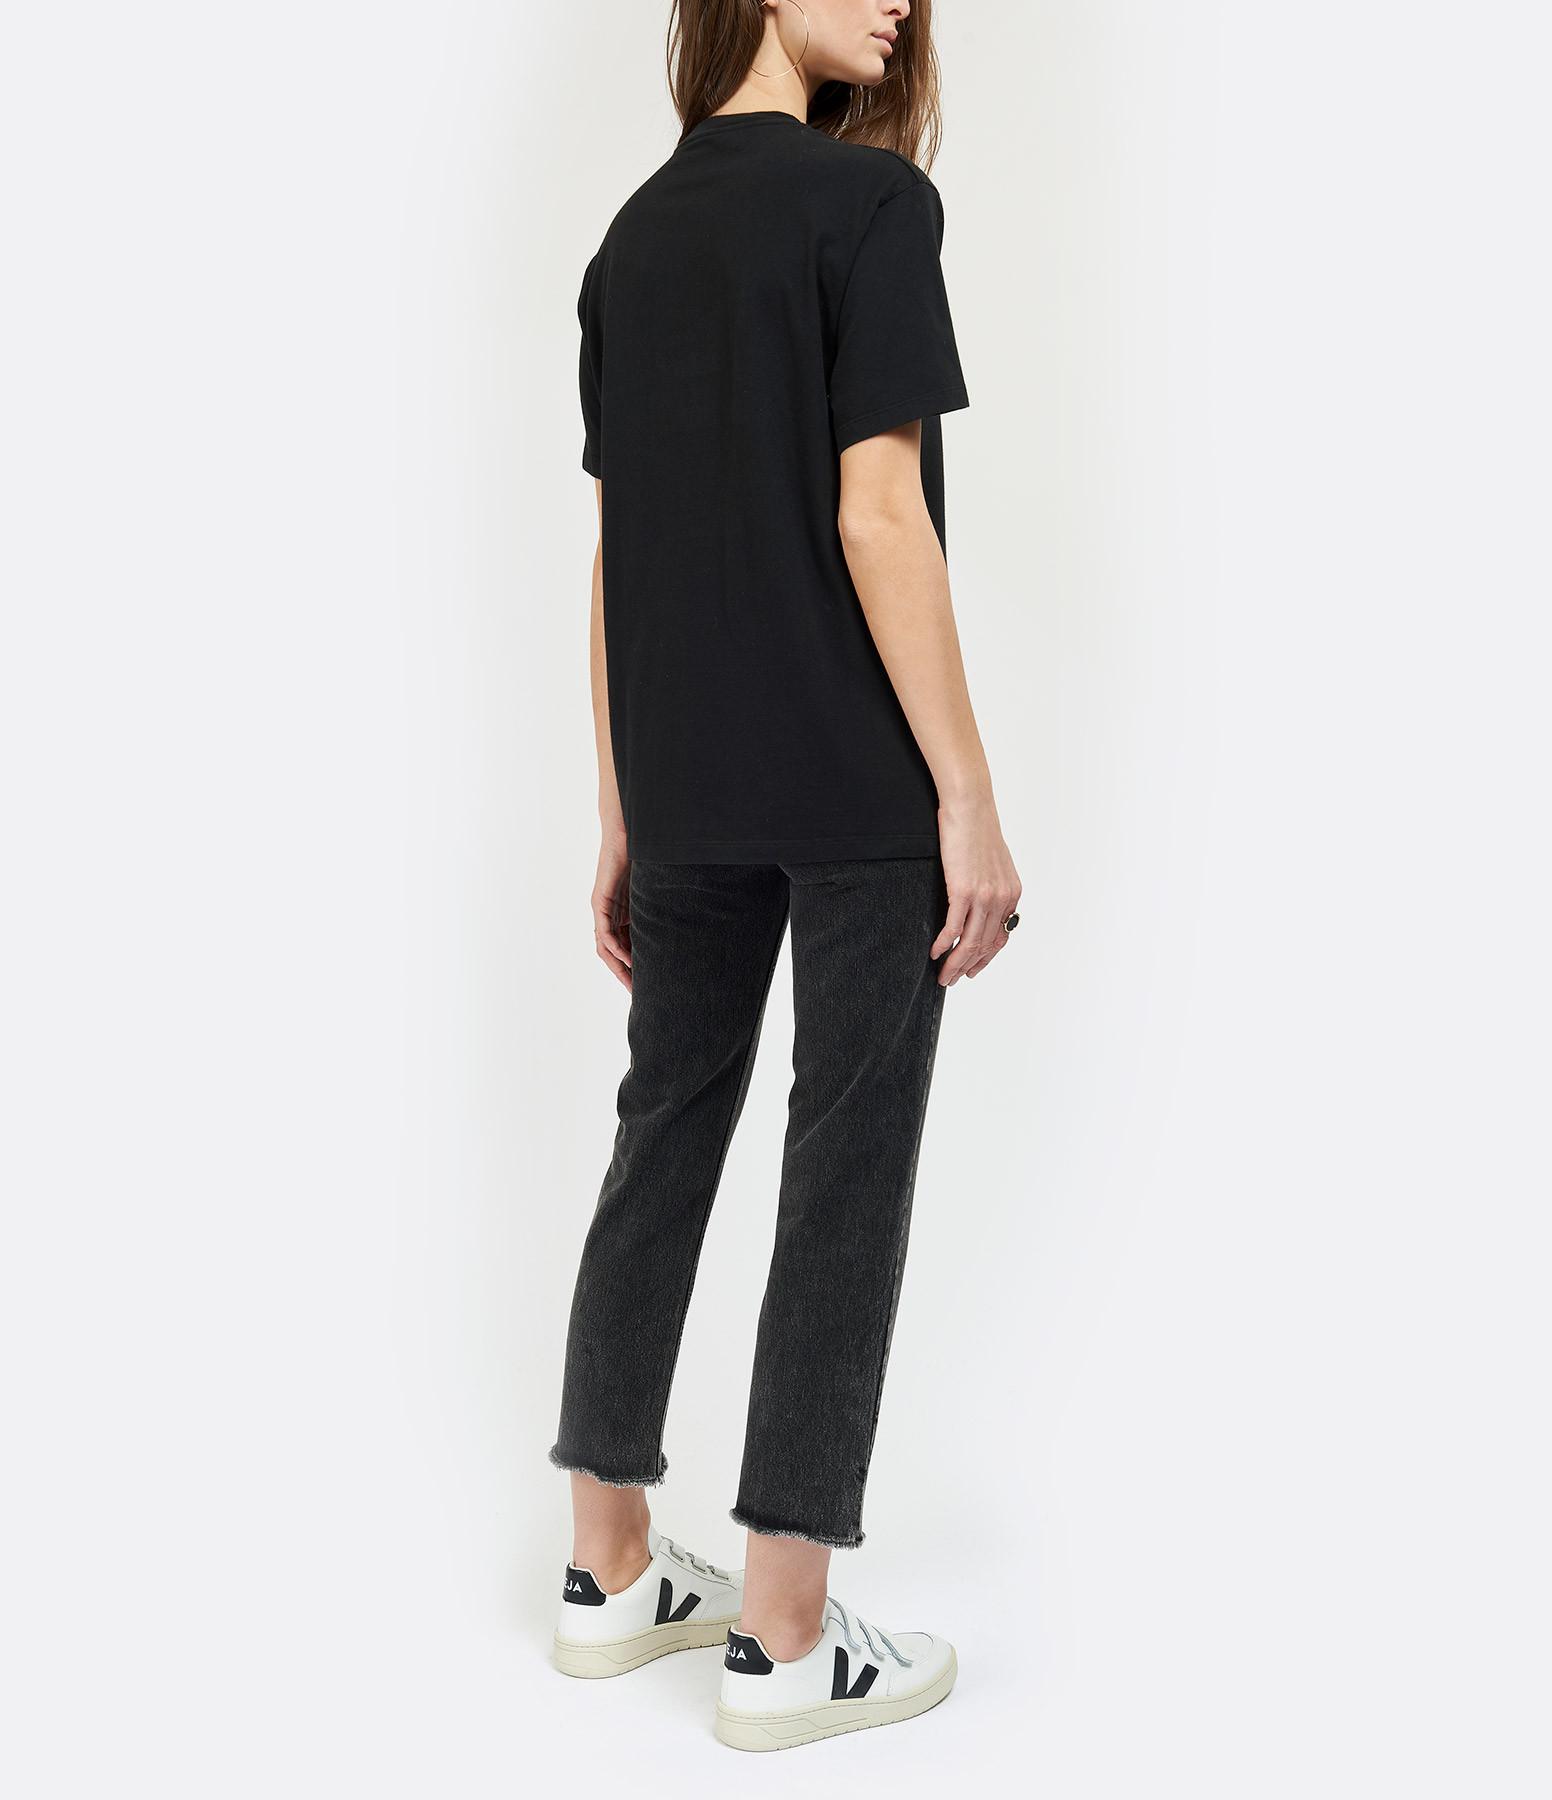 VEJA - Baskets V-12 Velcro Cuir Blanc Noir